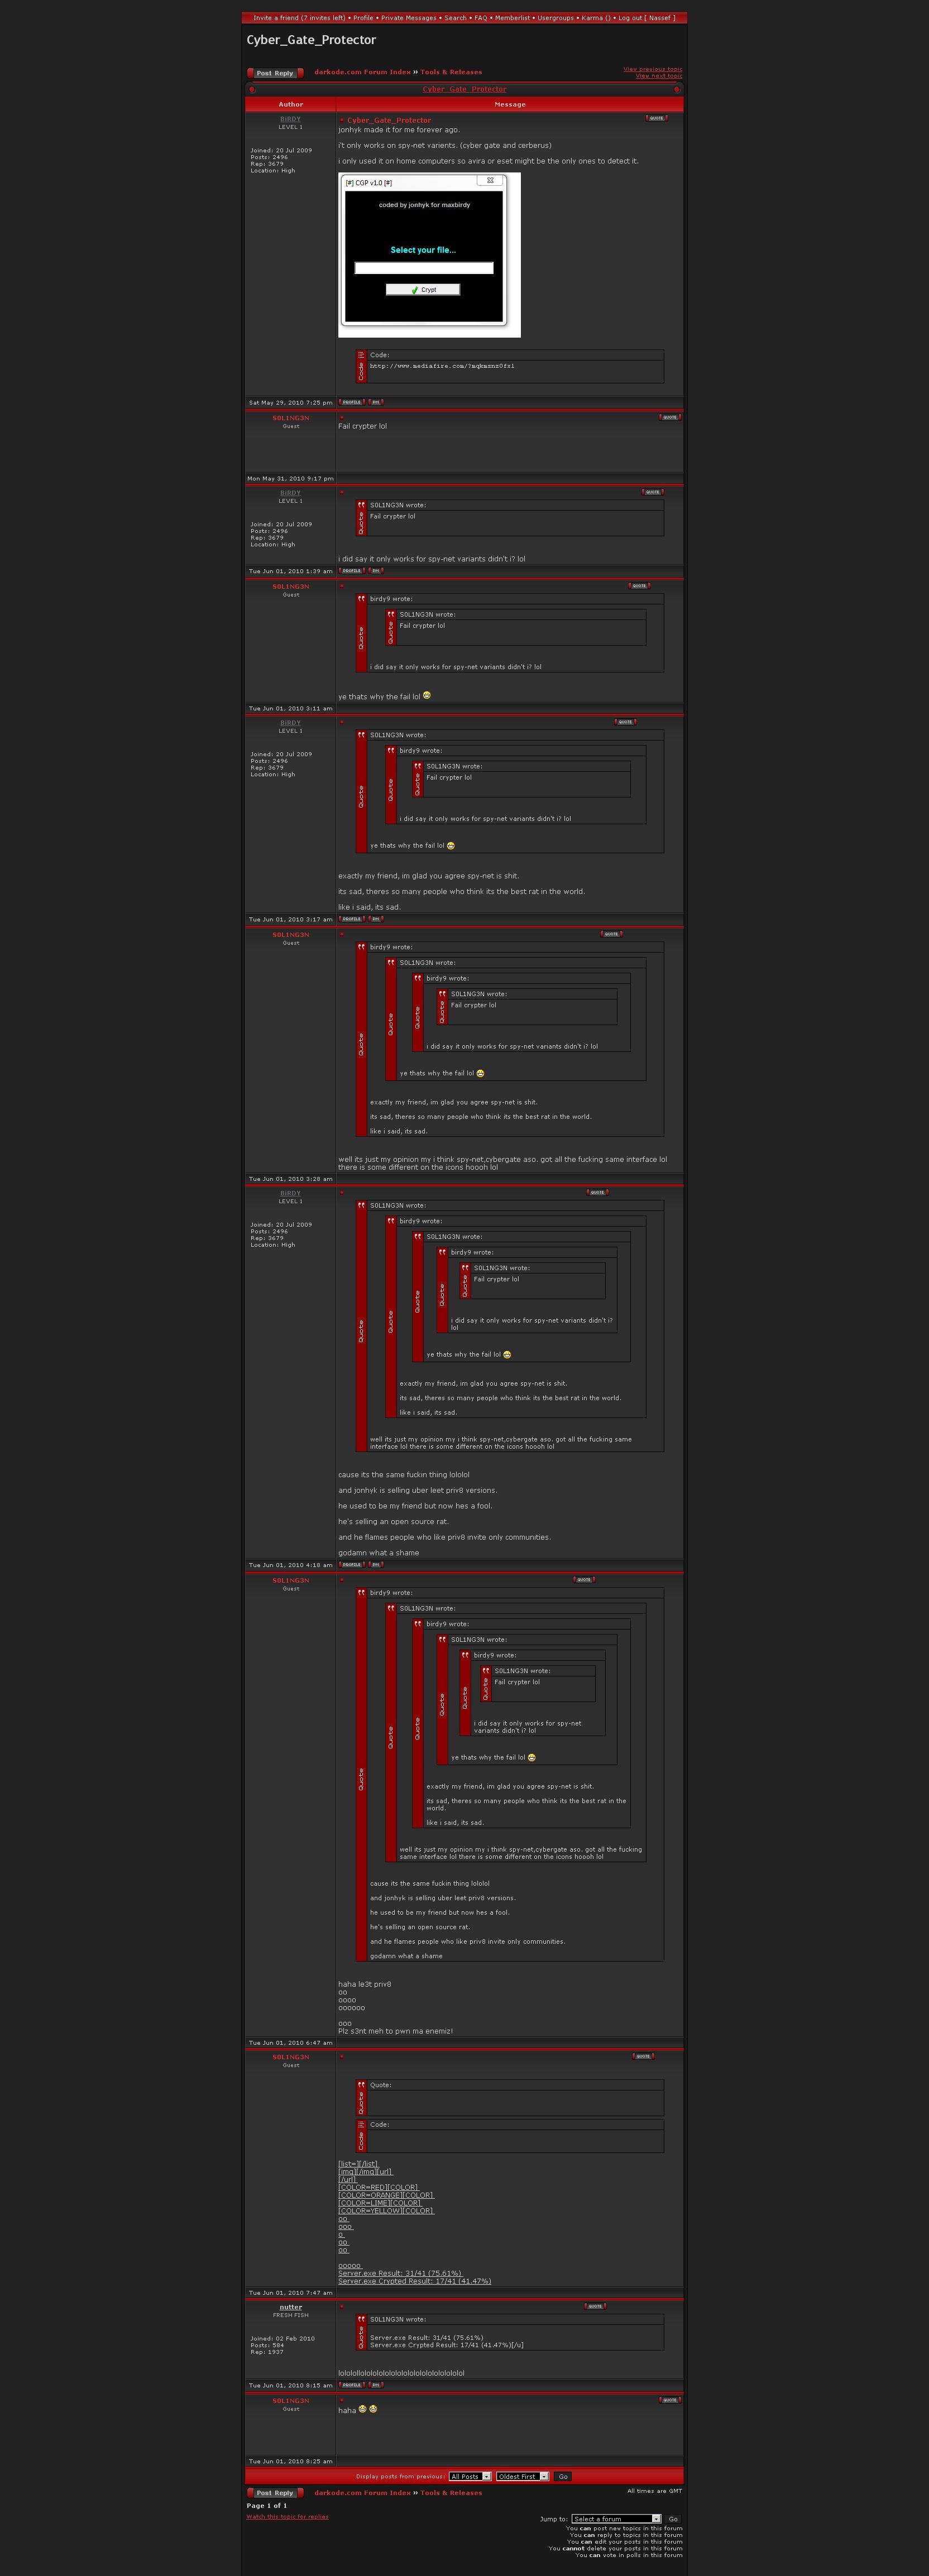 Darkode Repository - Index Of